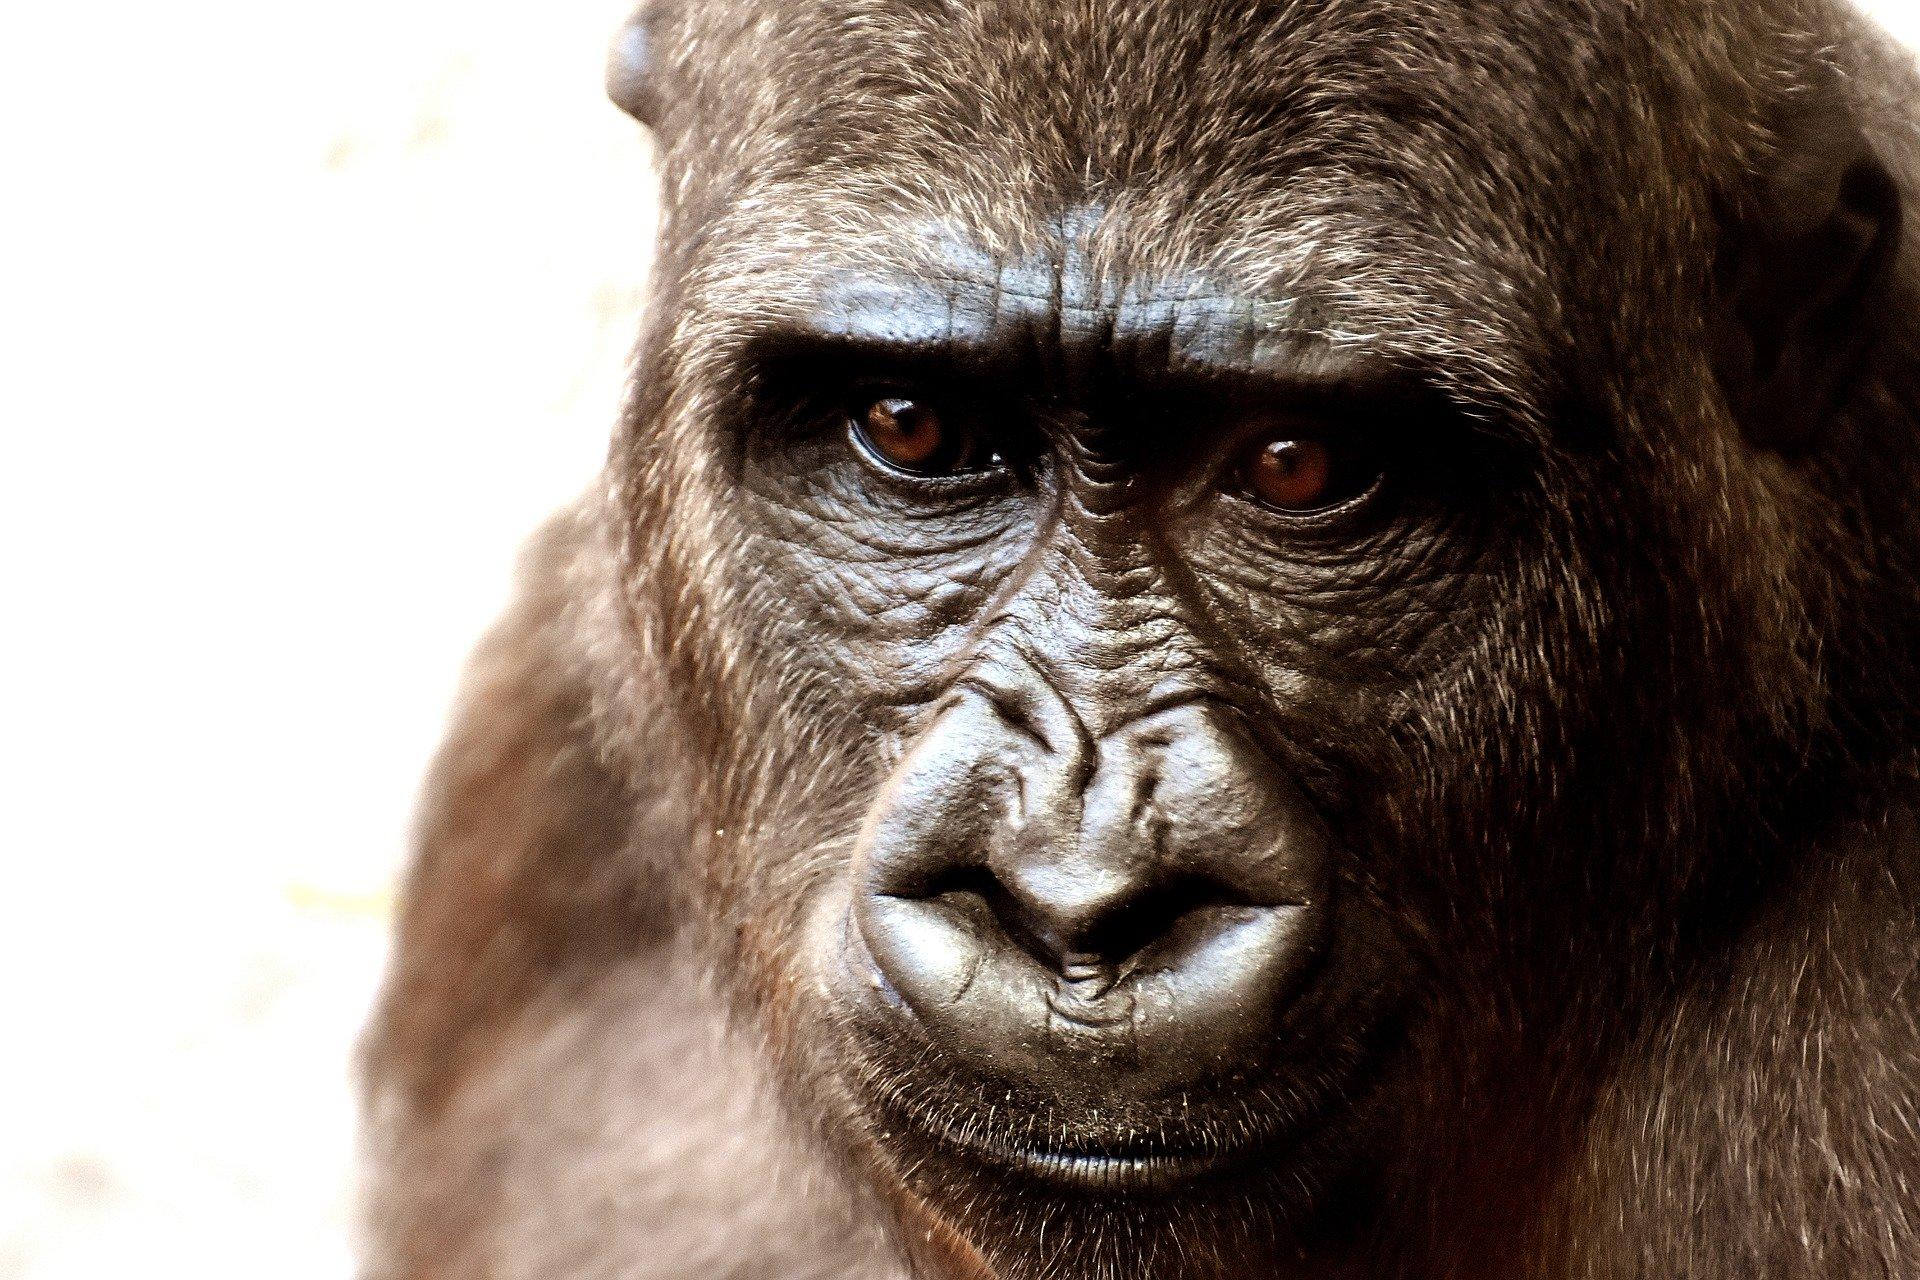 Gorilla Erschossen